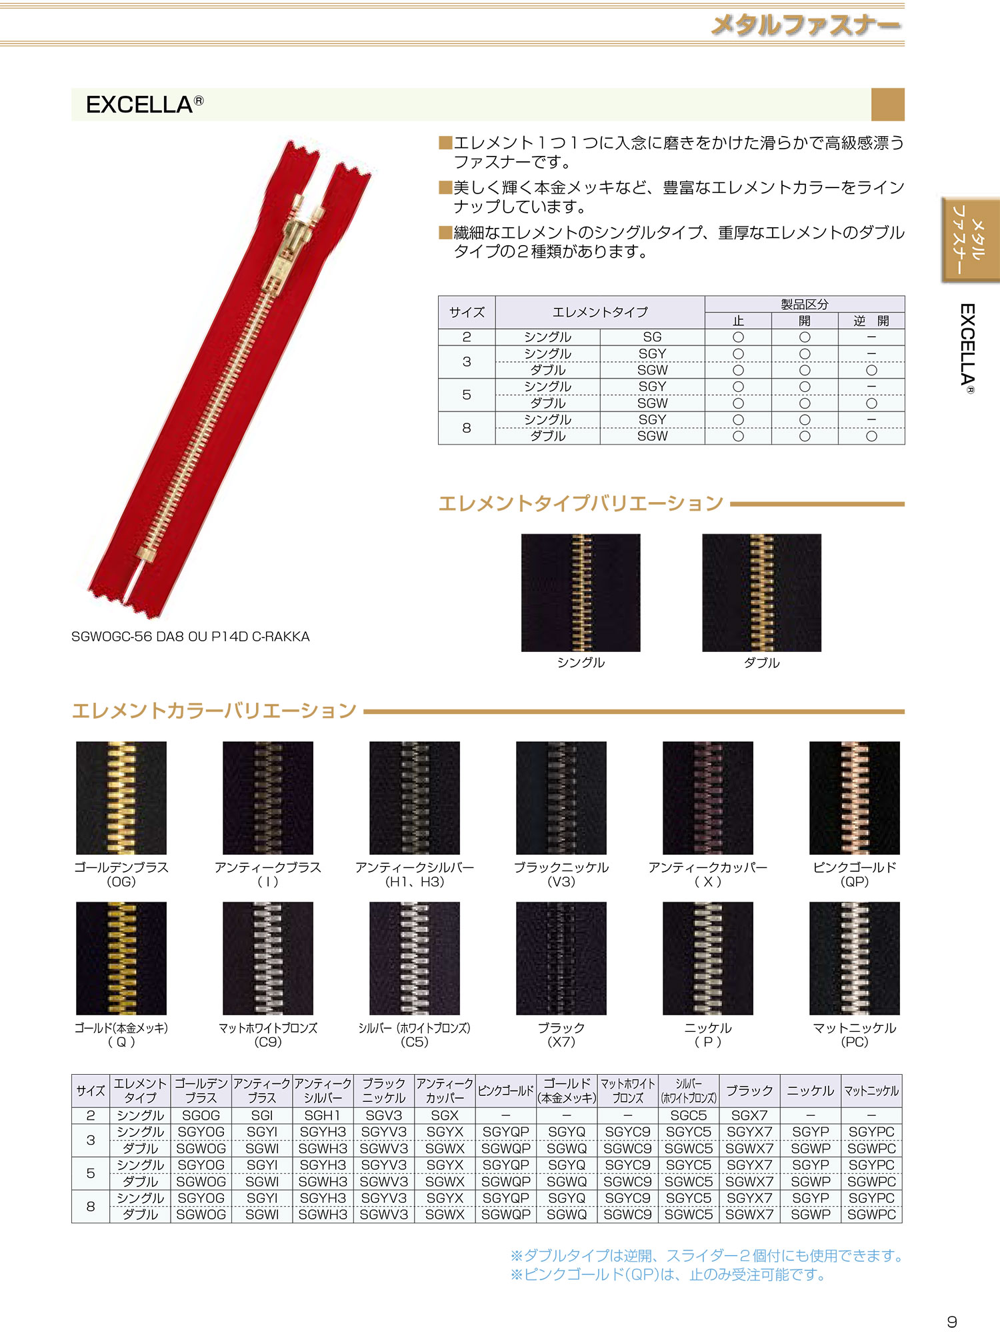 3SGWV3MR エクセラ 3サイズ ブラックニッケル 逆開 ダブル[ファスナー] YKK/オークラ商事 - ApparelX アパレル資材卸通販